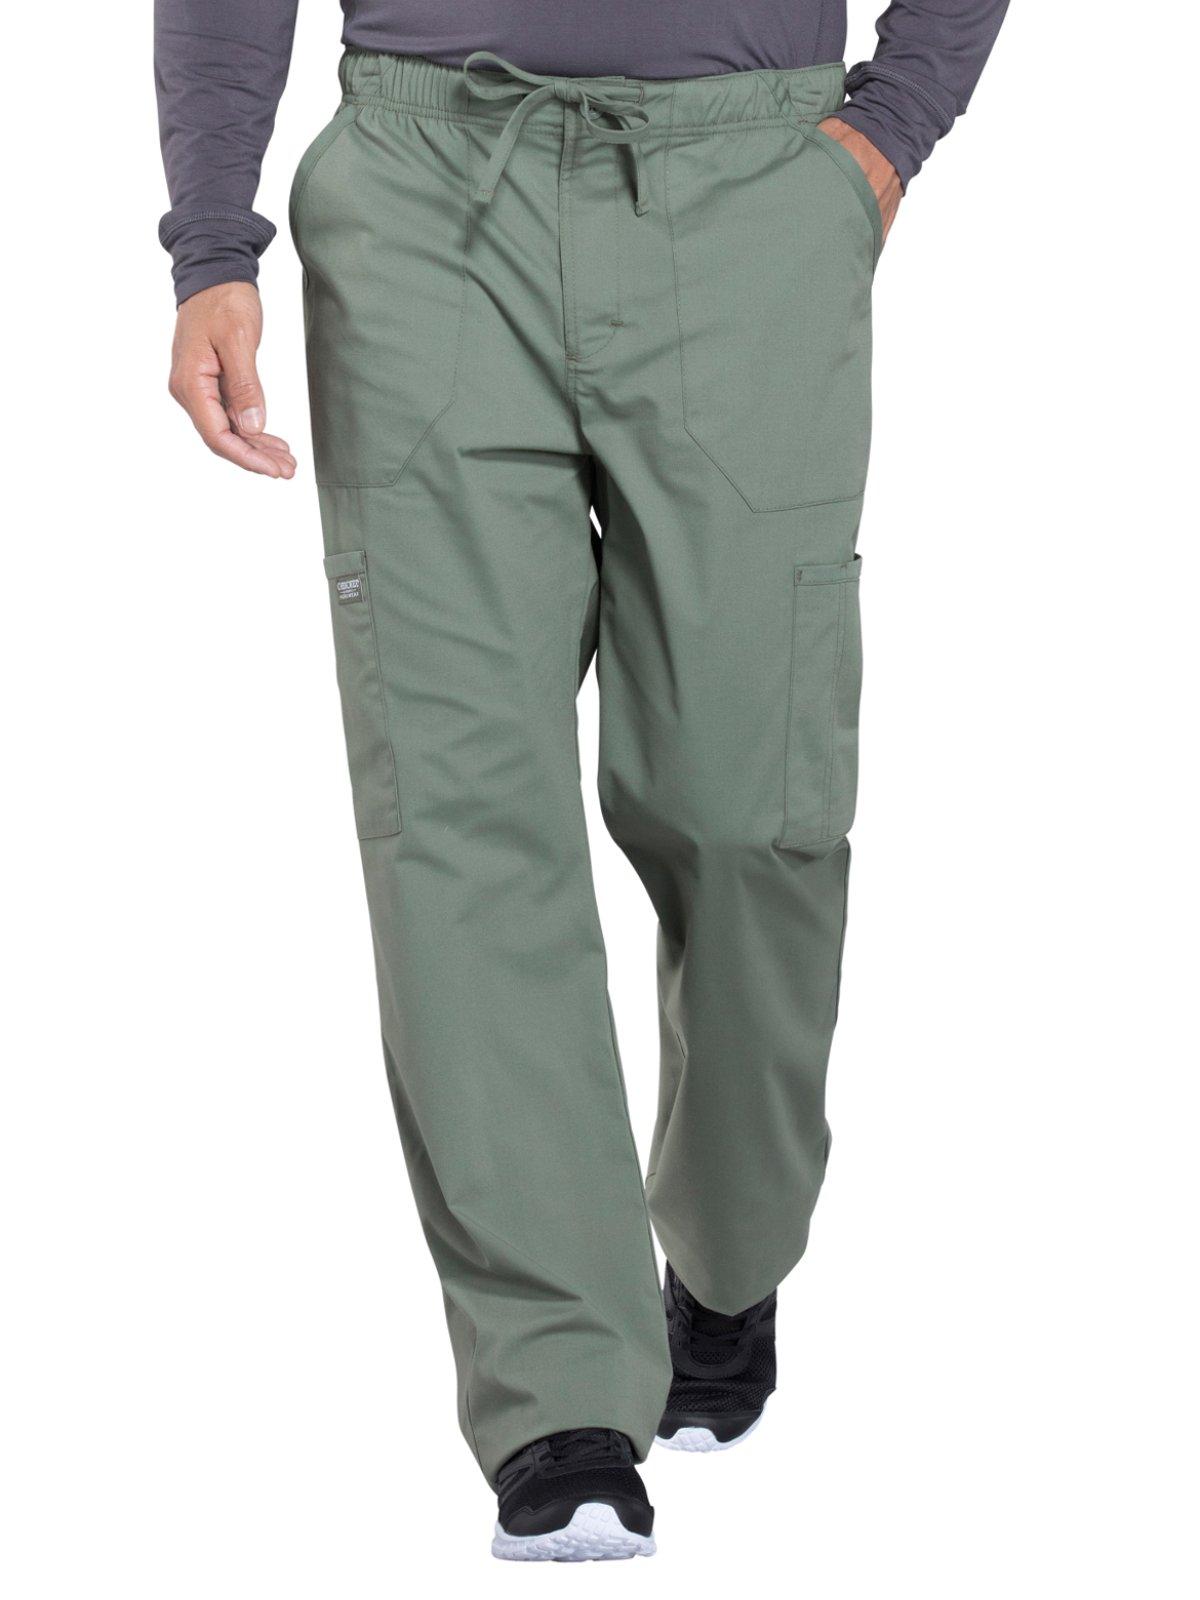 Cherokee Professionals Workwear Men's Tapered Leg Zip Fly Drawstring Scrub Pant Medium Olive